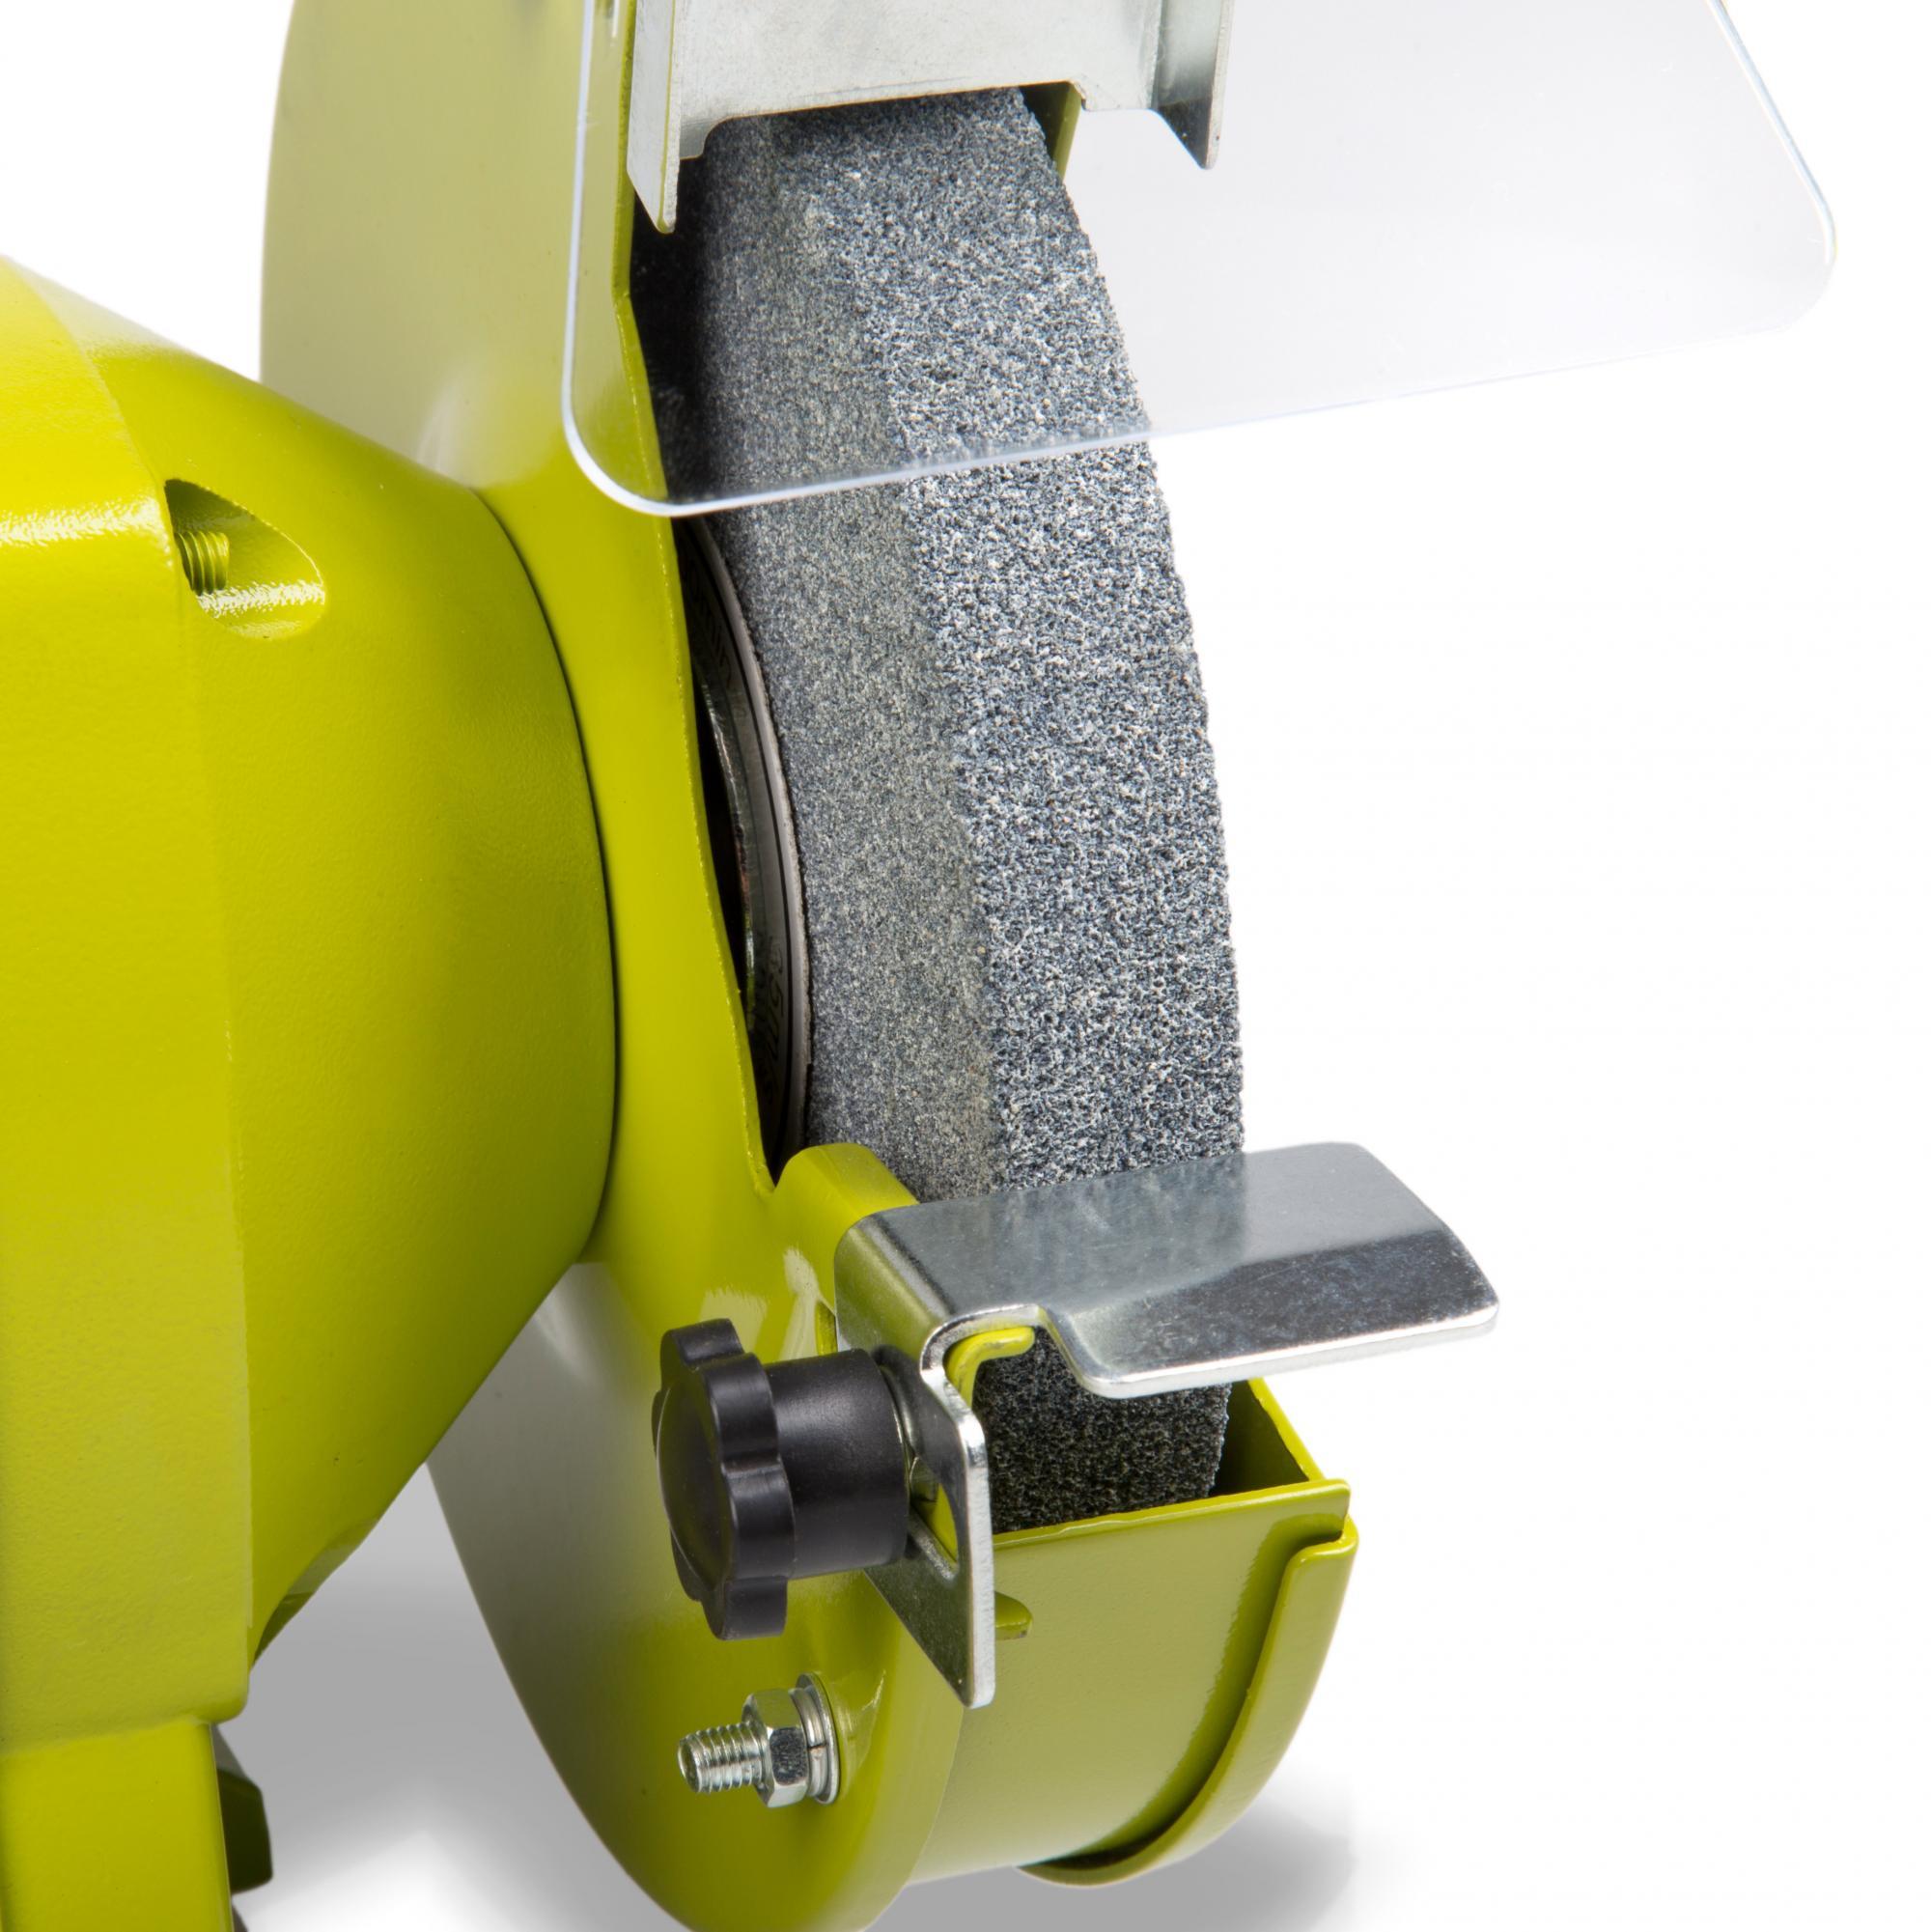 250 w doppelschleifer nassschleifer schleifger t schleifbock nass trocken ebay. Black Bedroom Furniture Sets. Home Design Ideas